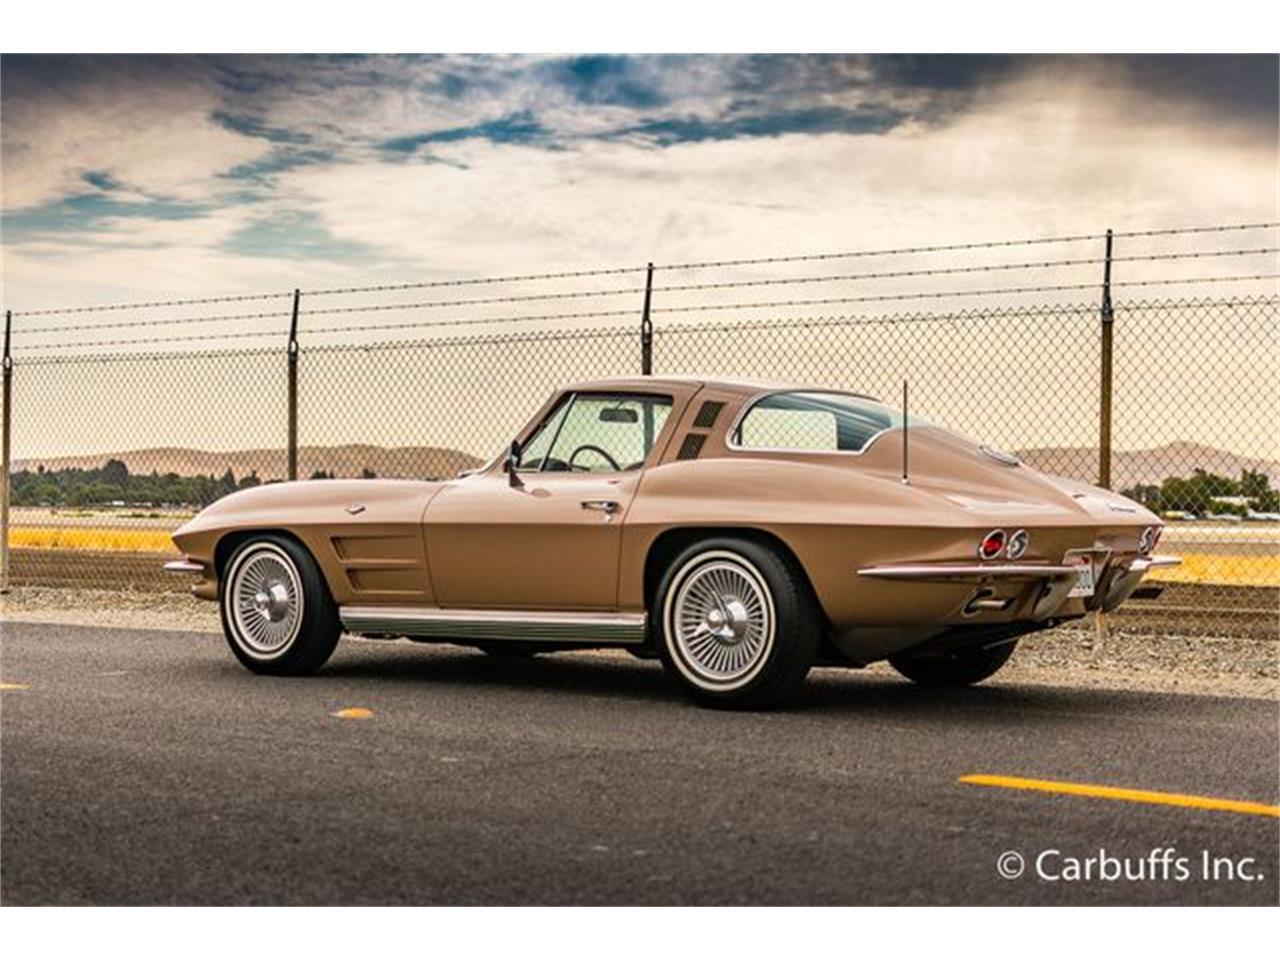 Large Picture of '64 Corvette located in Concord California - LSQ2